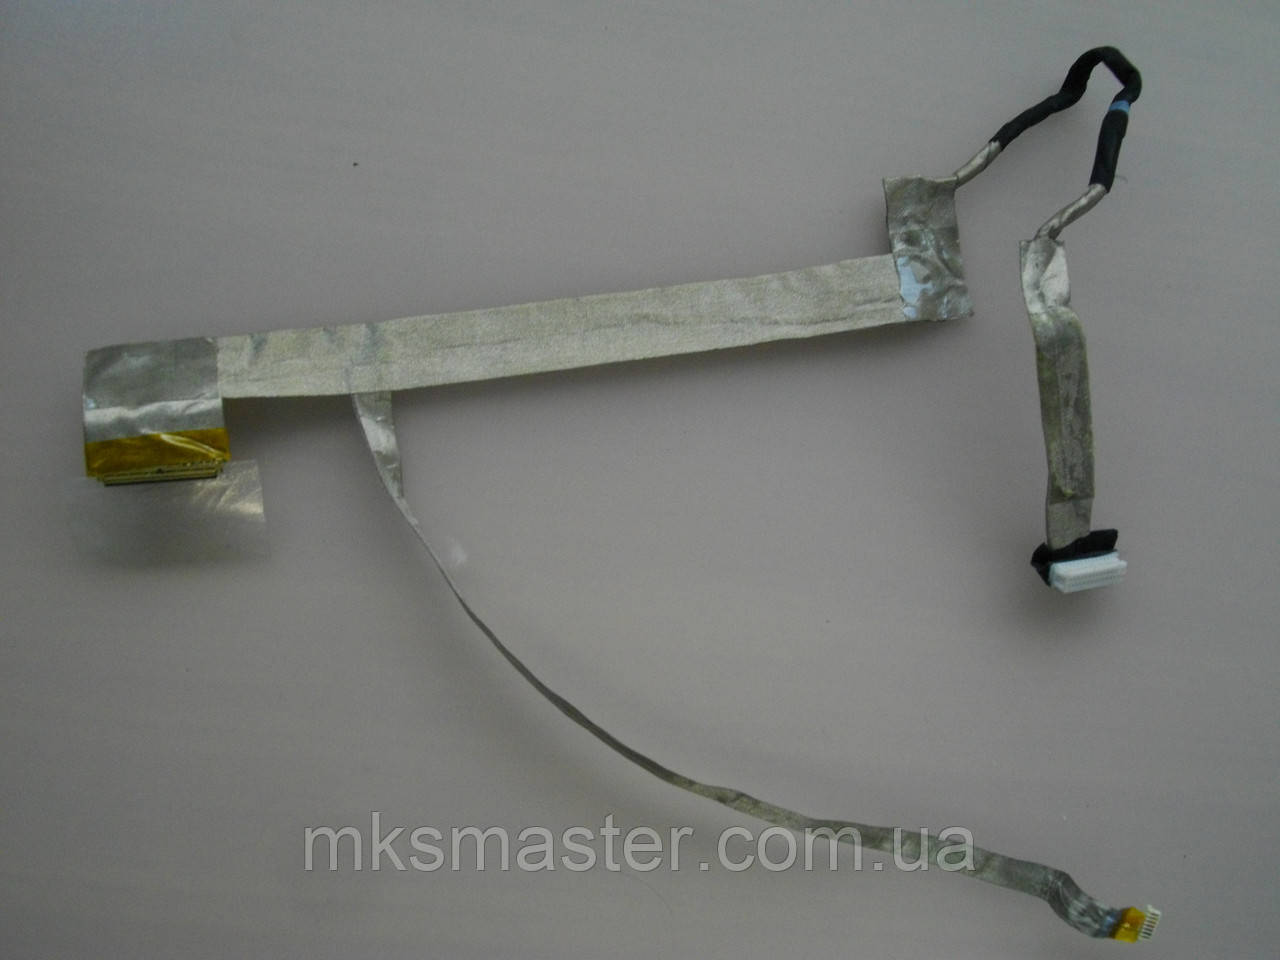 Шлейф матрицы 50.4IP02.102 (CN-05WXP2-12960-24J00OD-A00) DELL Vostro 1540